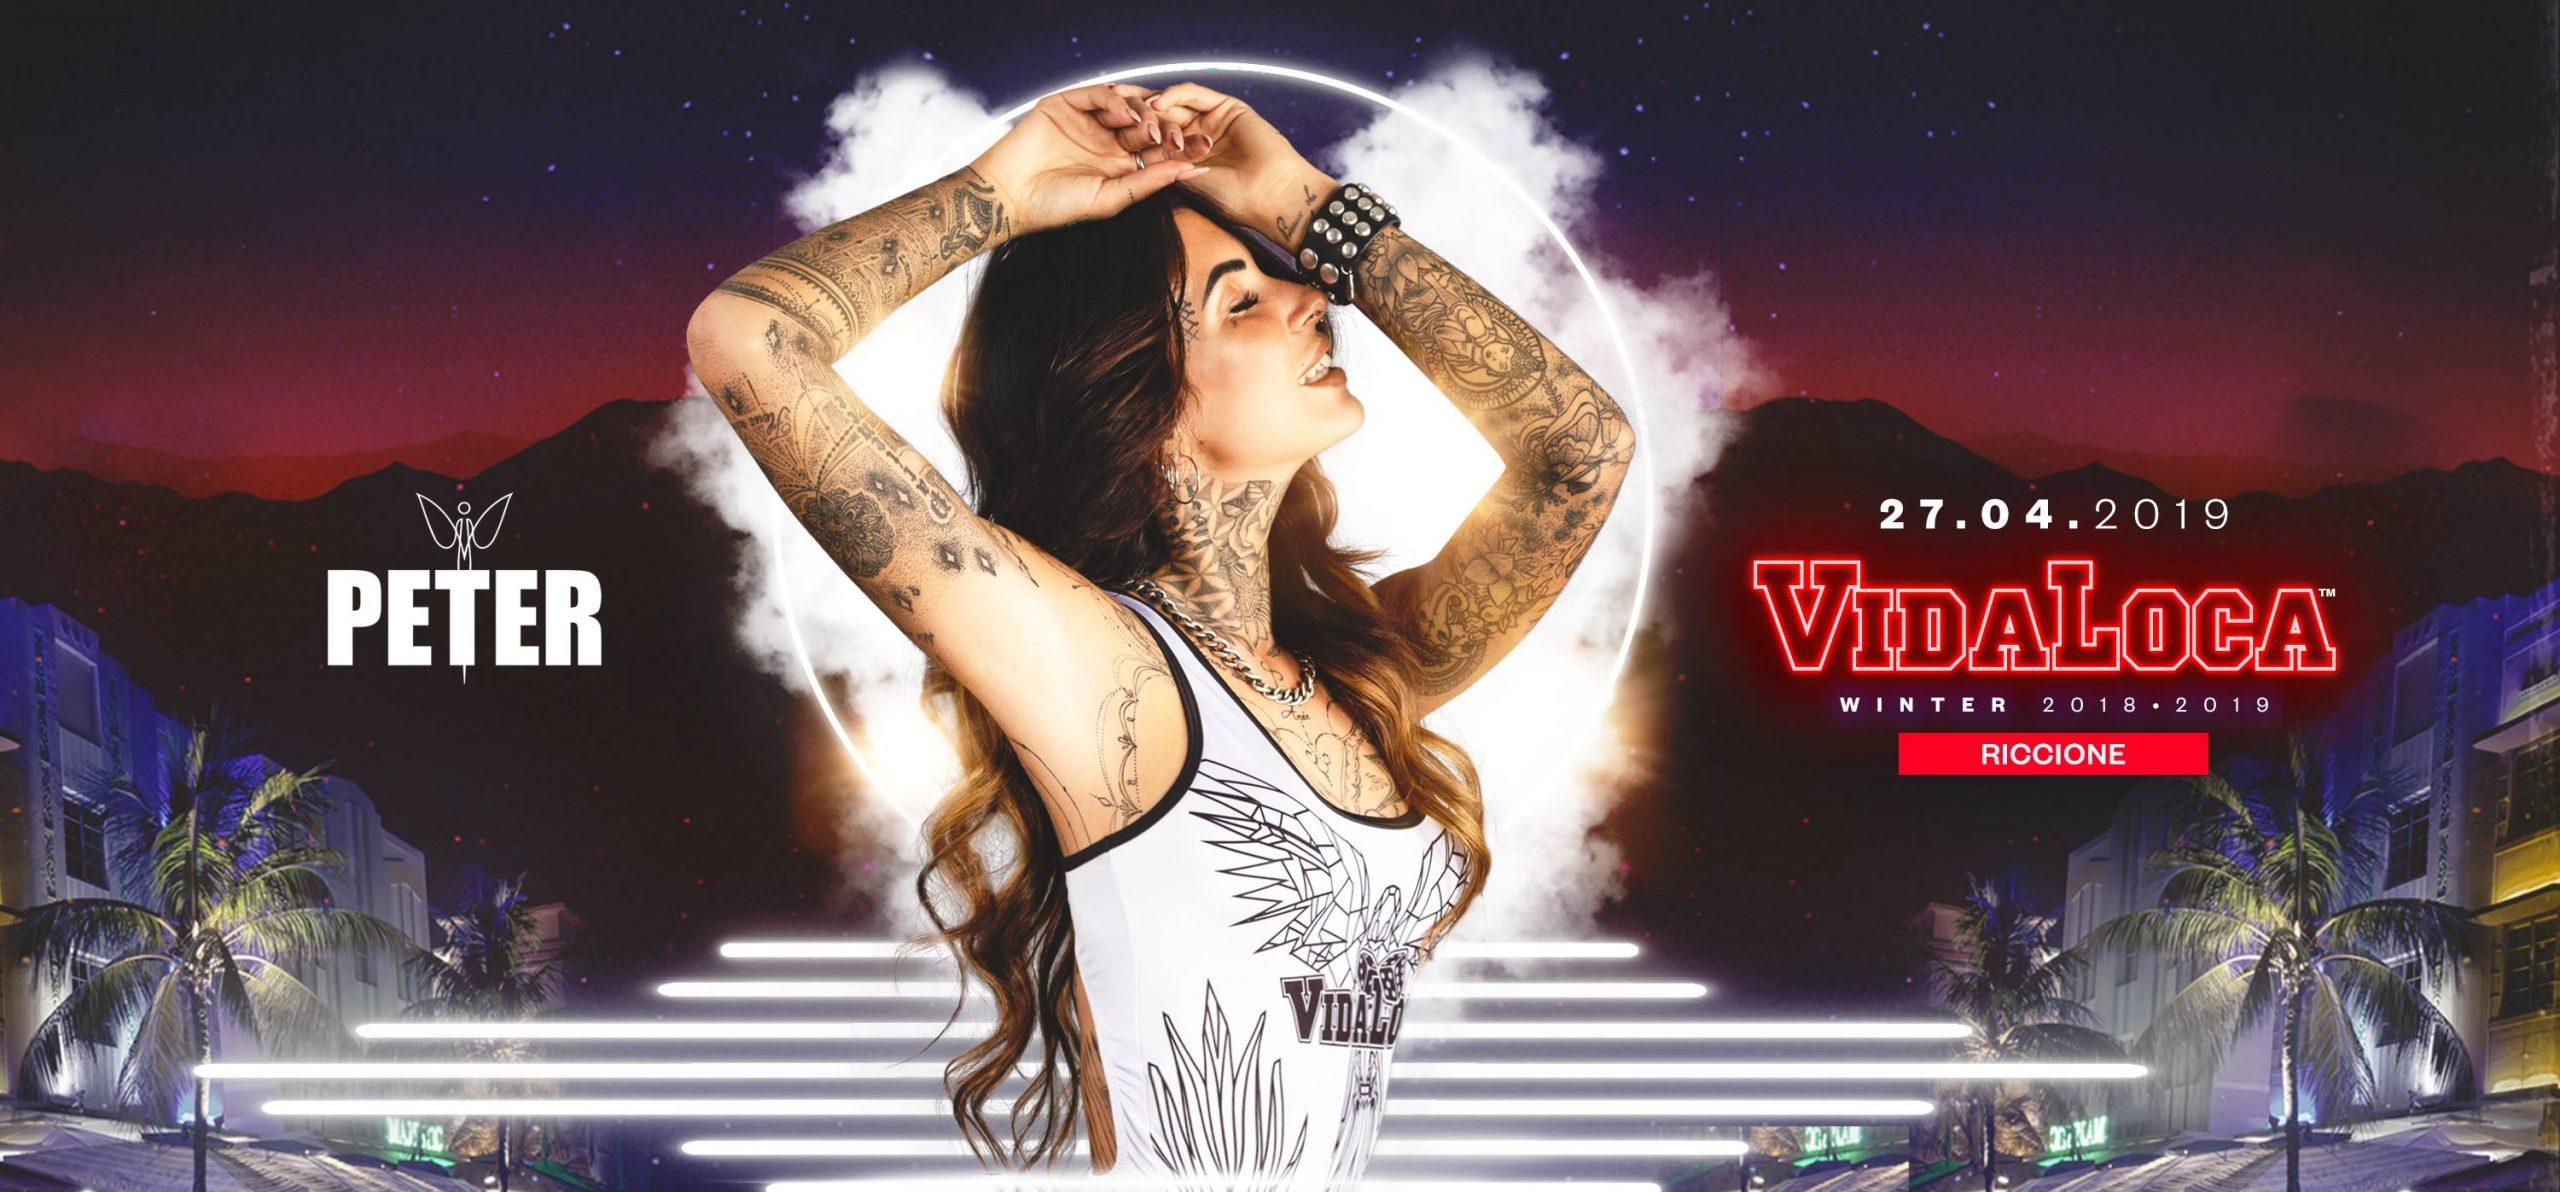 vida loca peter pan 27 aprile 2019 ticket pacchetti